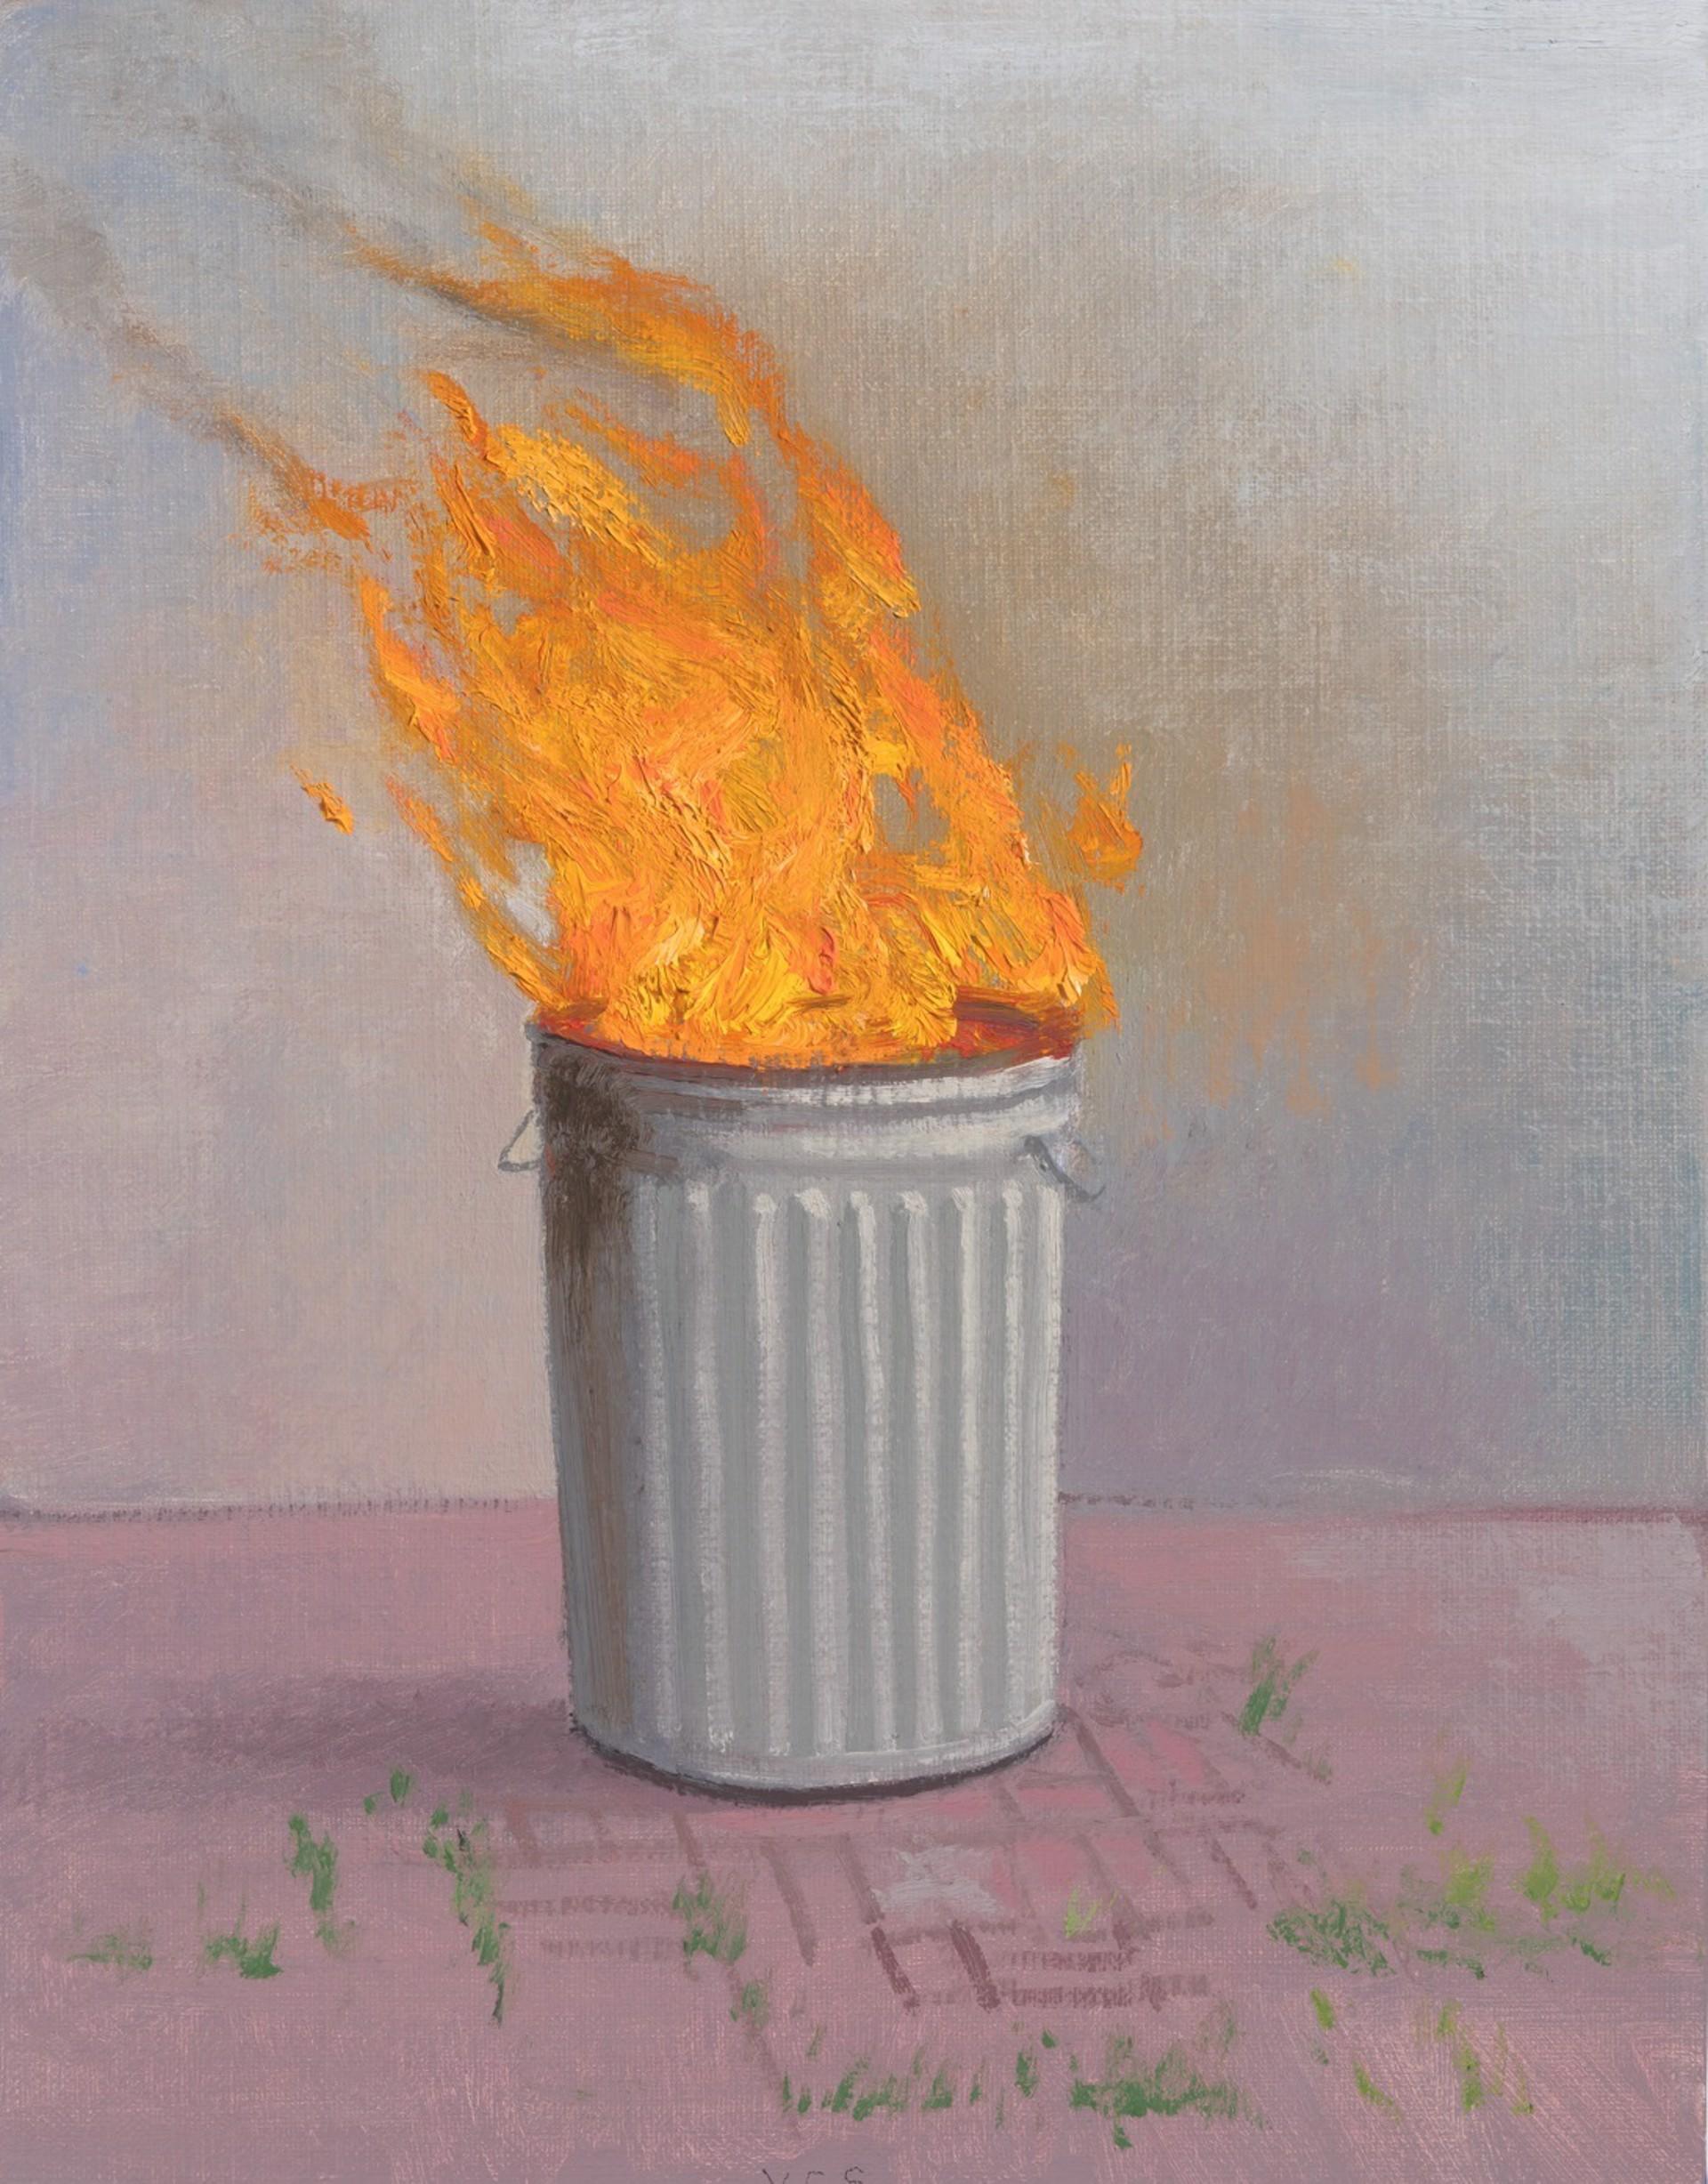 Trashfire III by Vonn Cummings Sumner